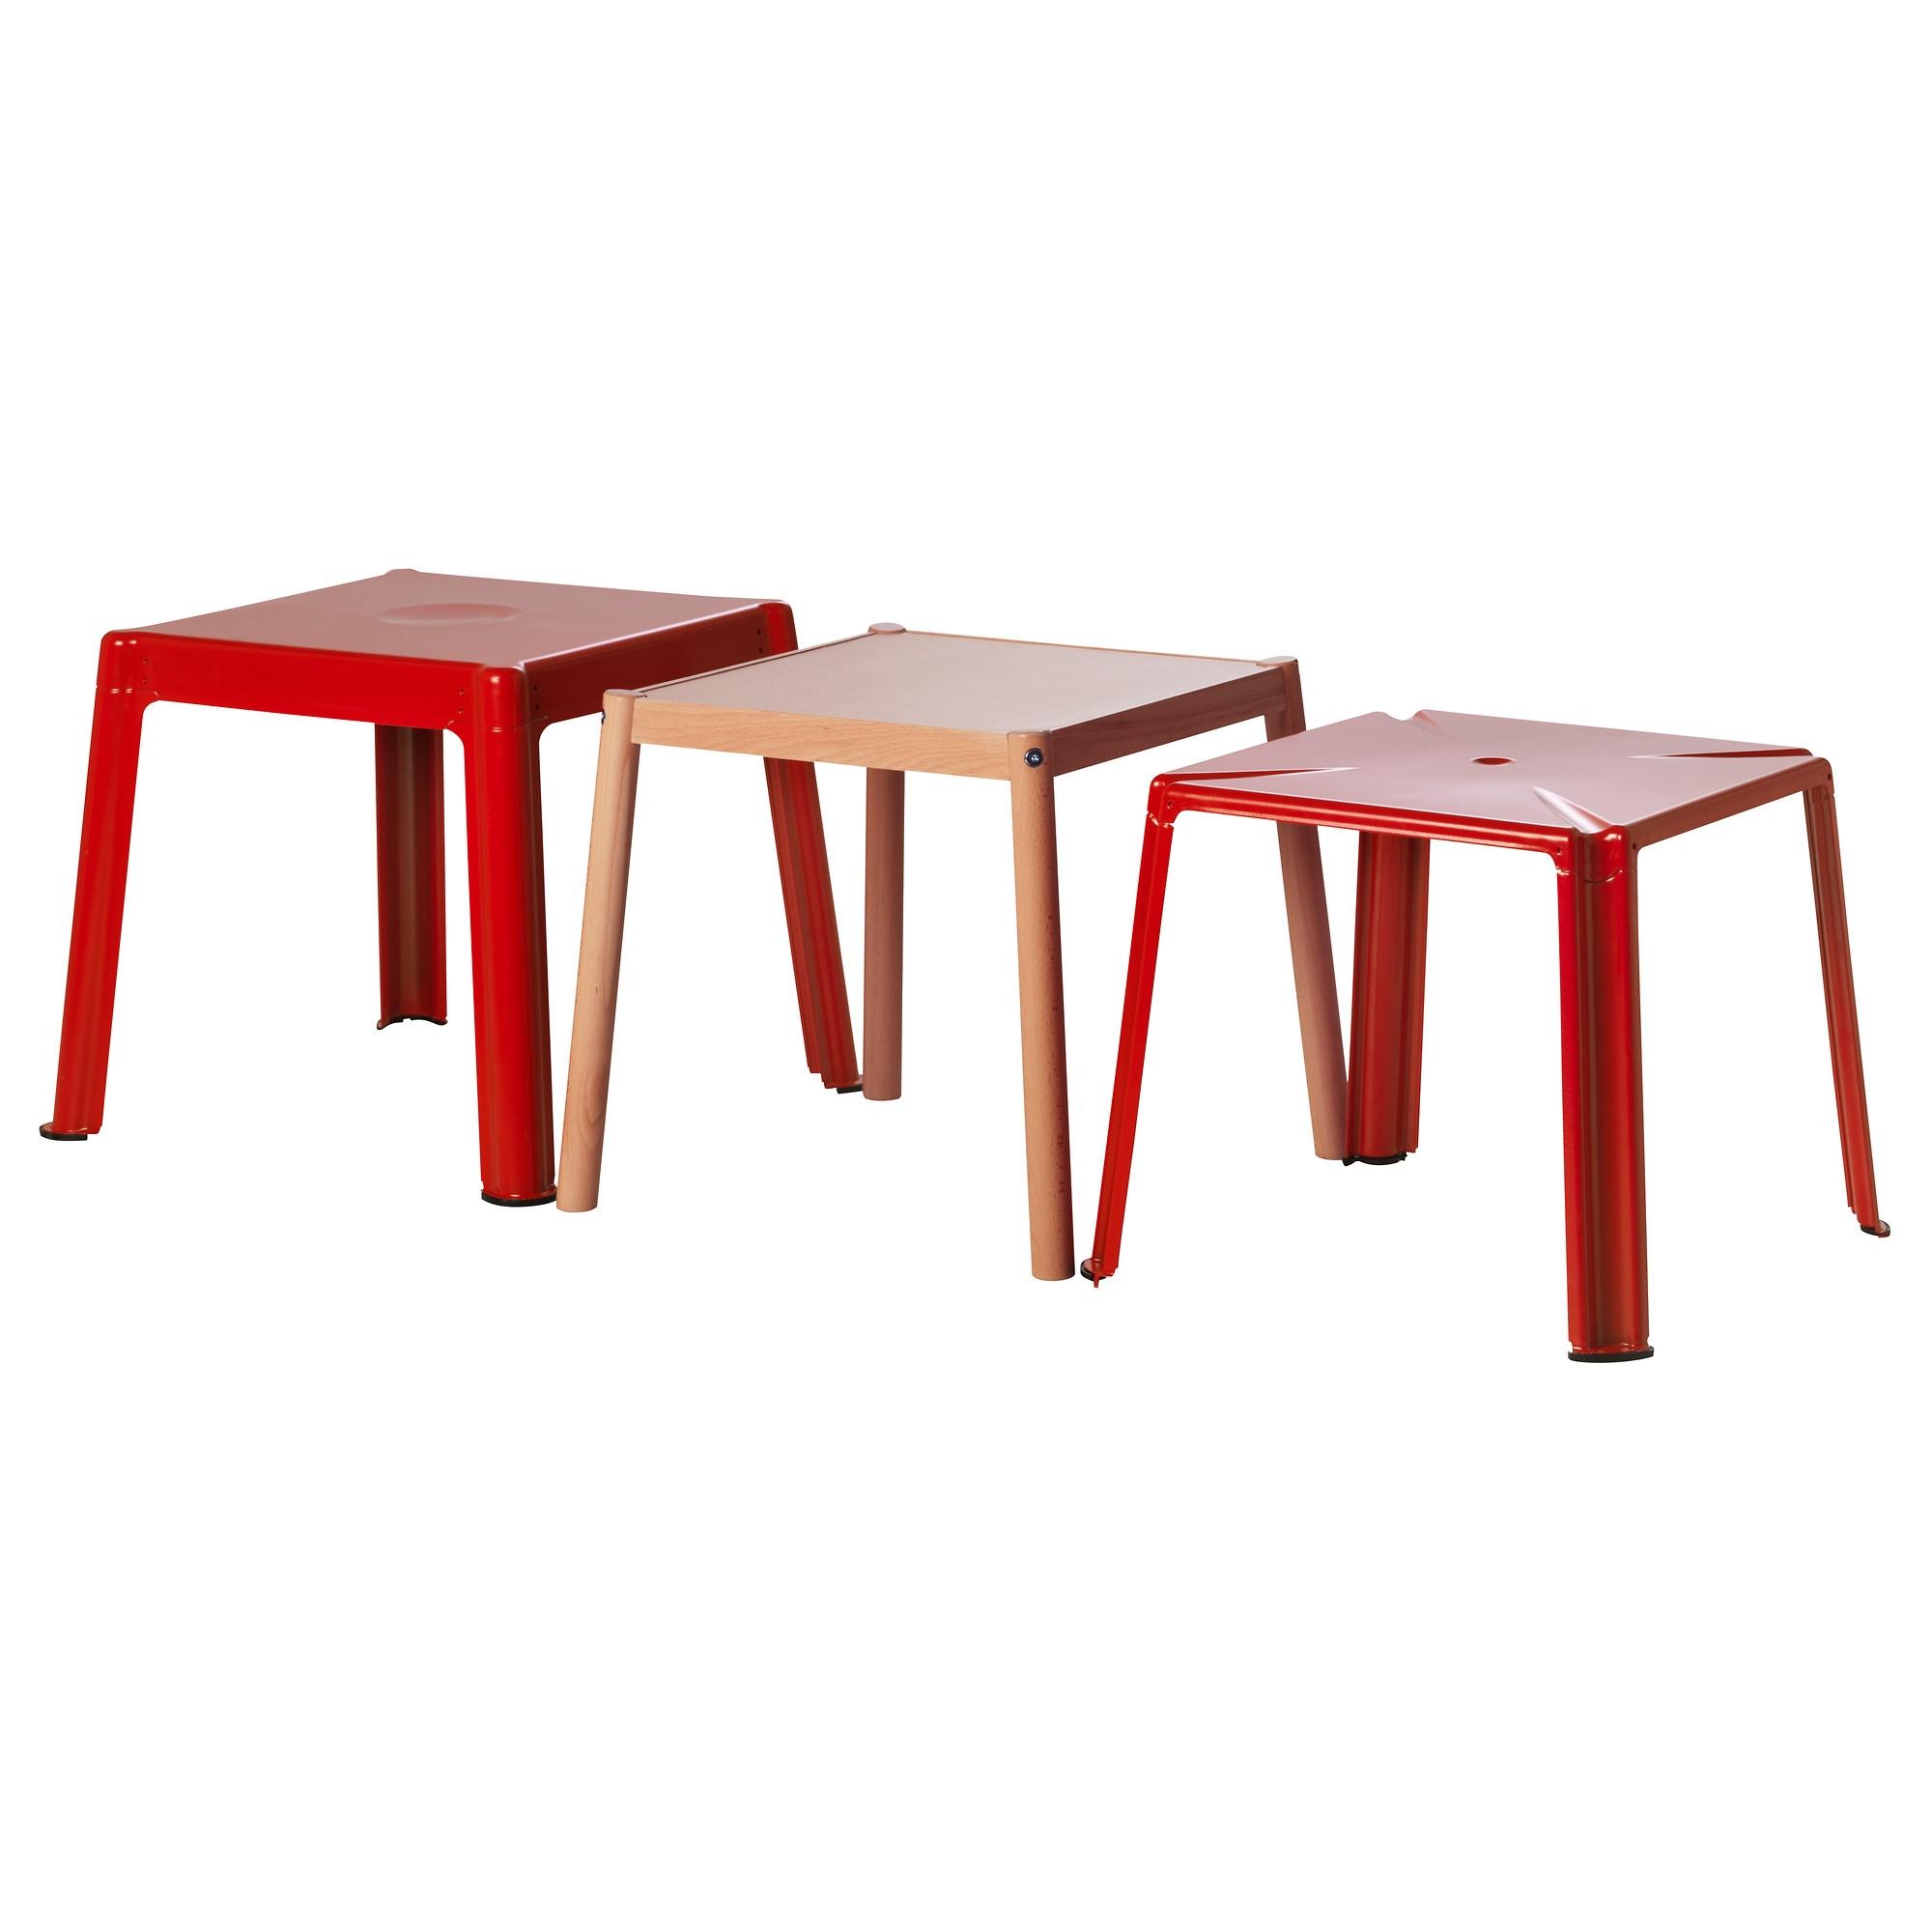 ikea mallorca detalles producto. Black Bedroom Furniture Sets. Home Design Ideas